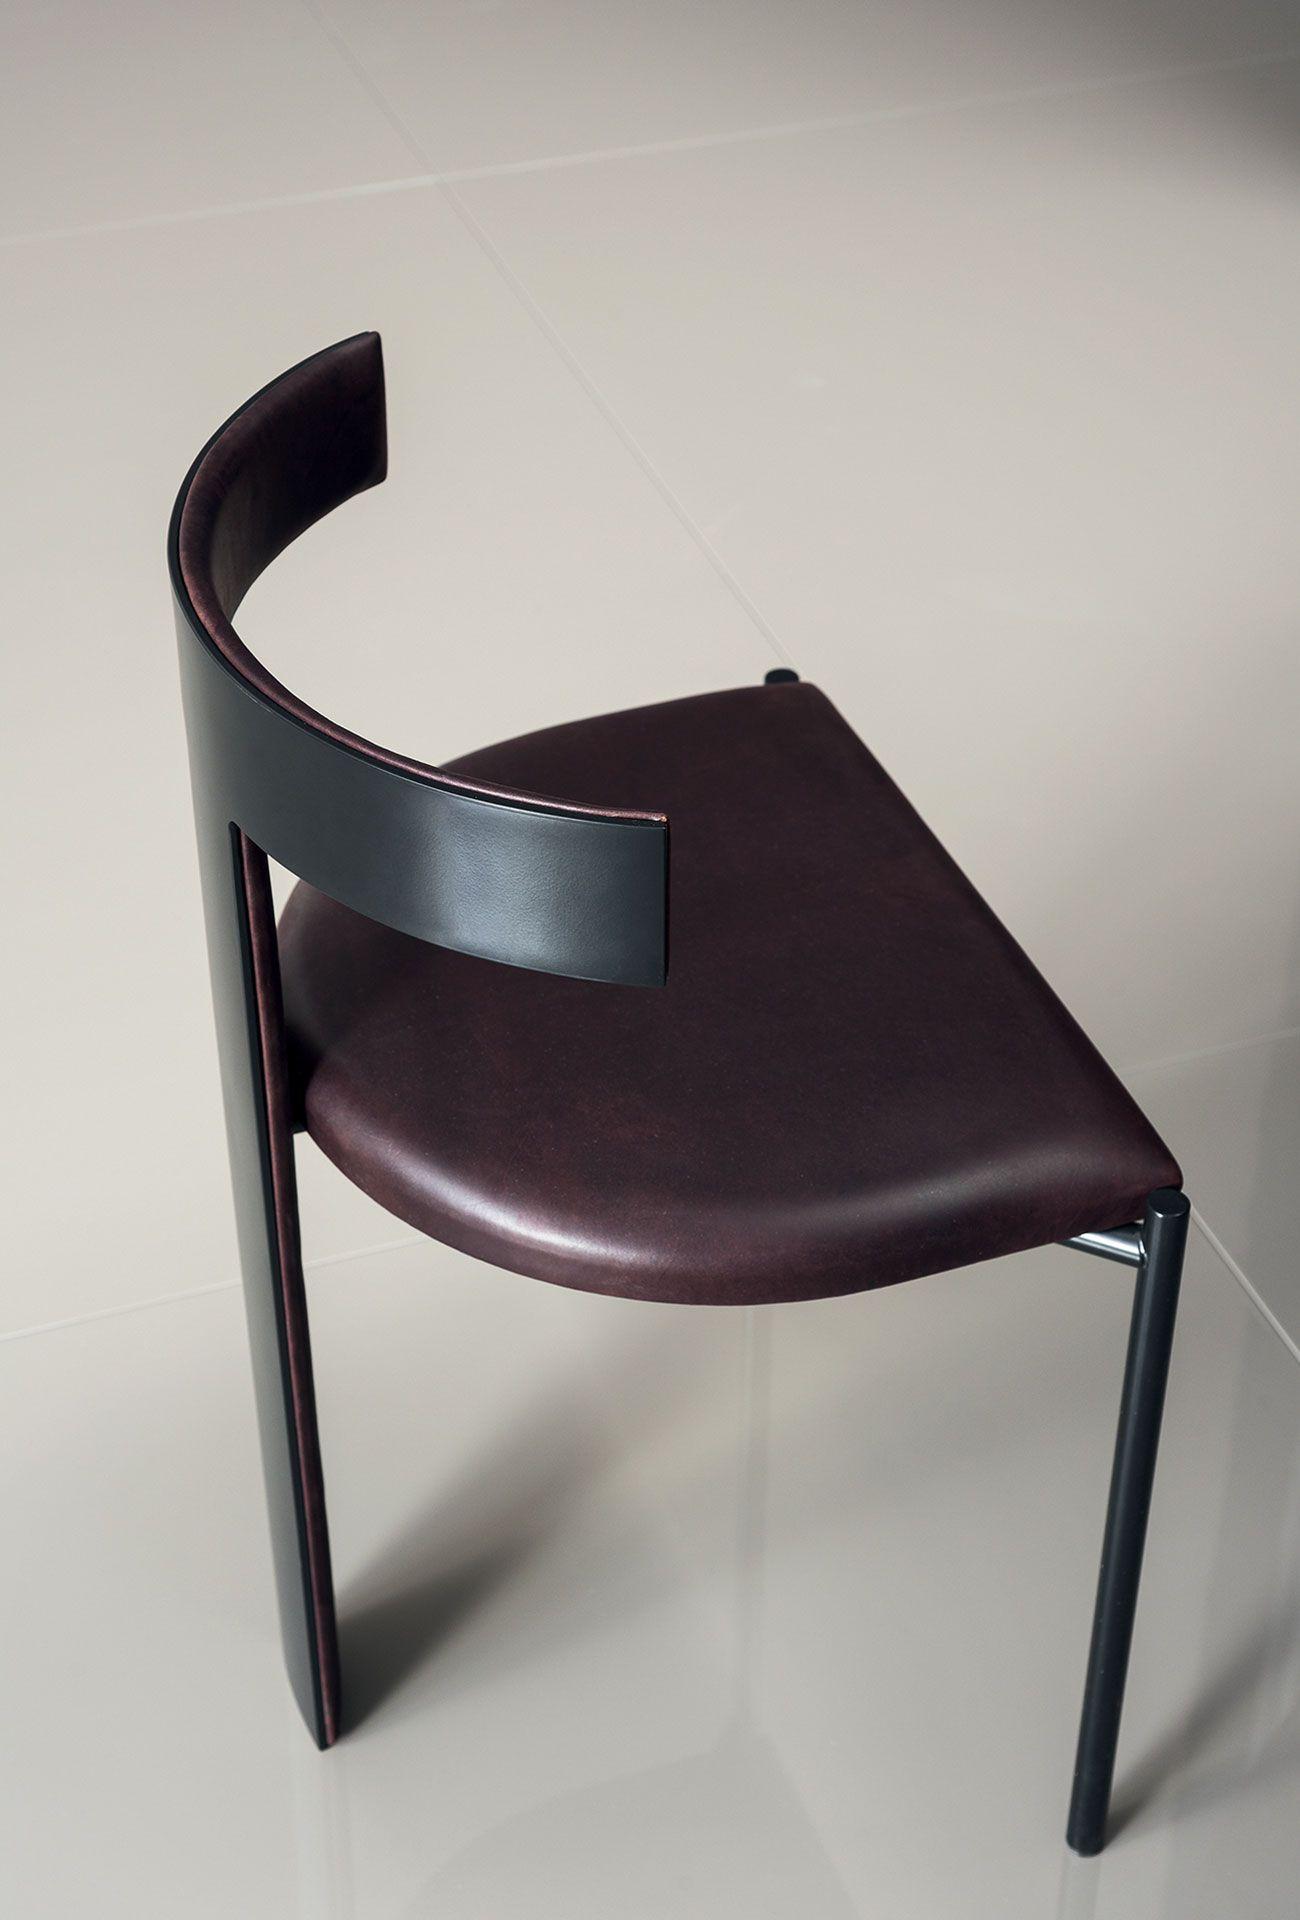 SEDIA IN PELLE ZEFIR | Baxter | 【单椅】 en 2019 | Chair ...